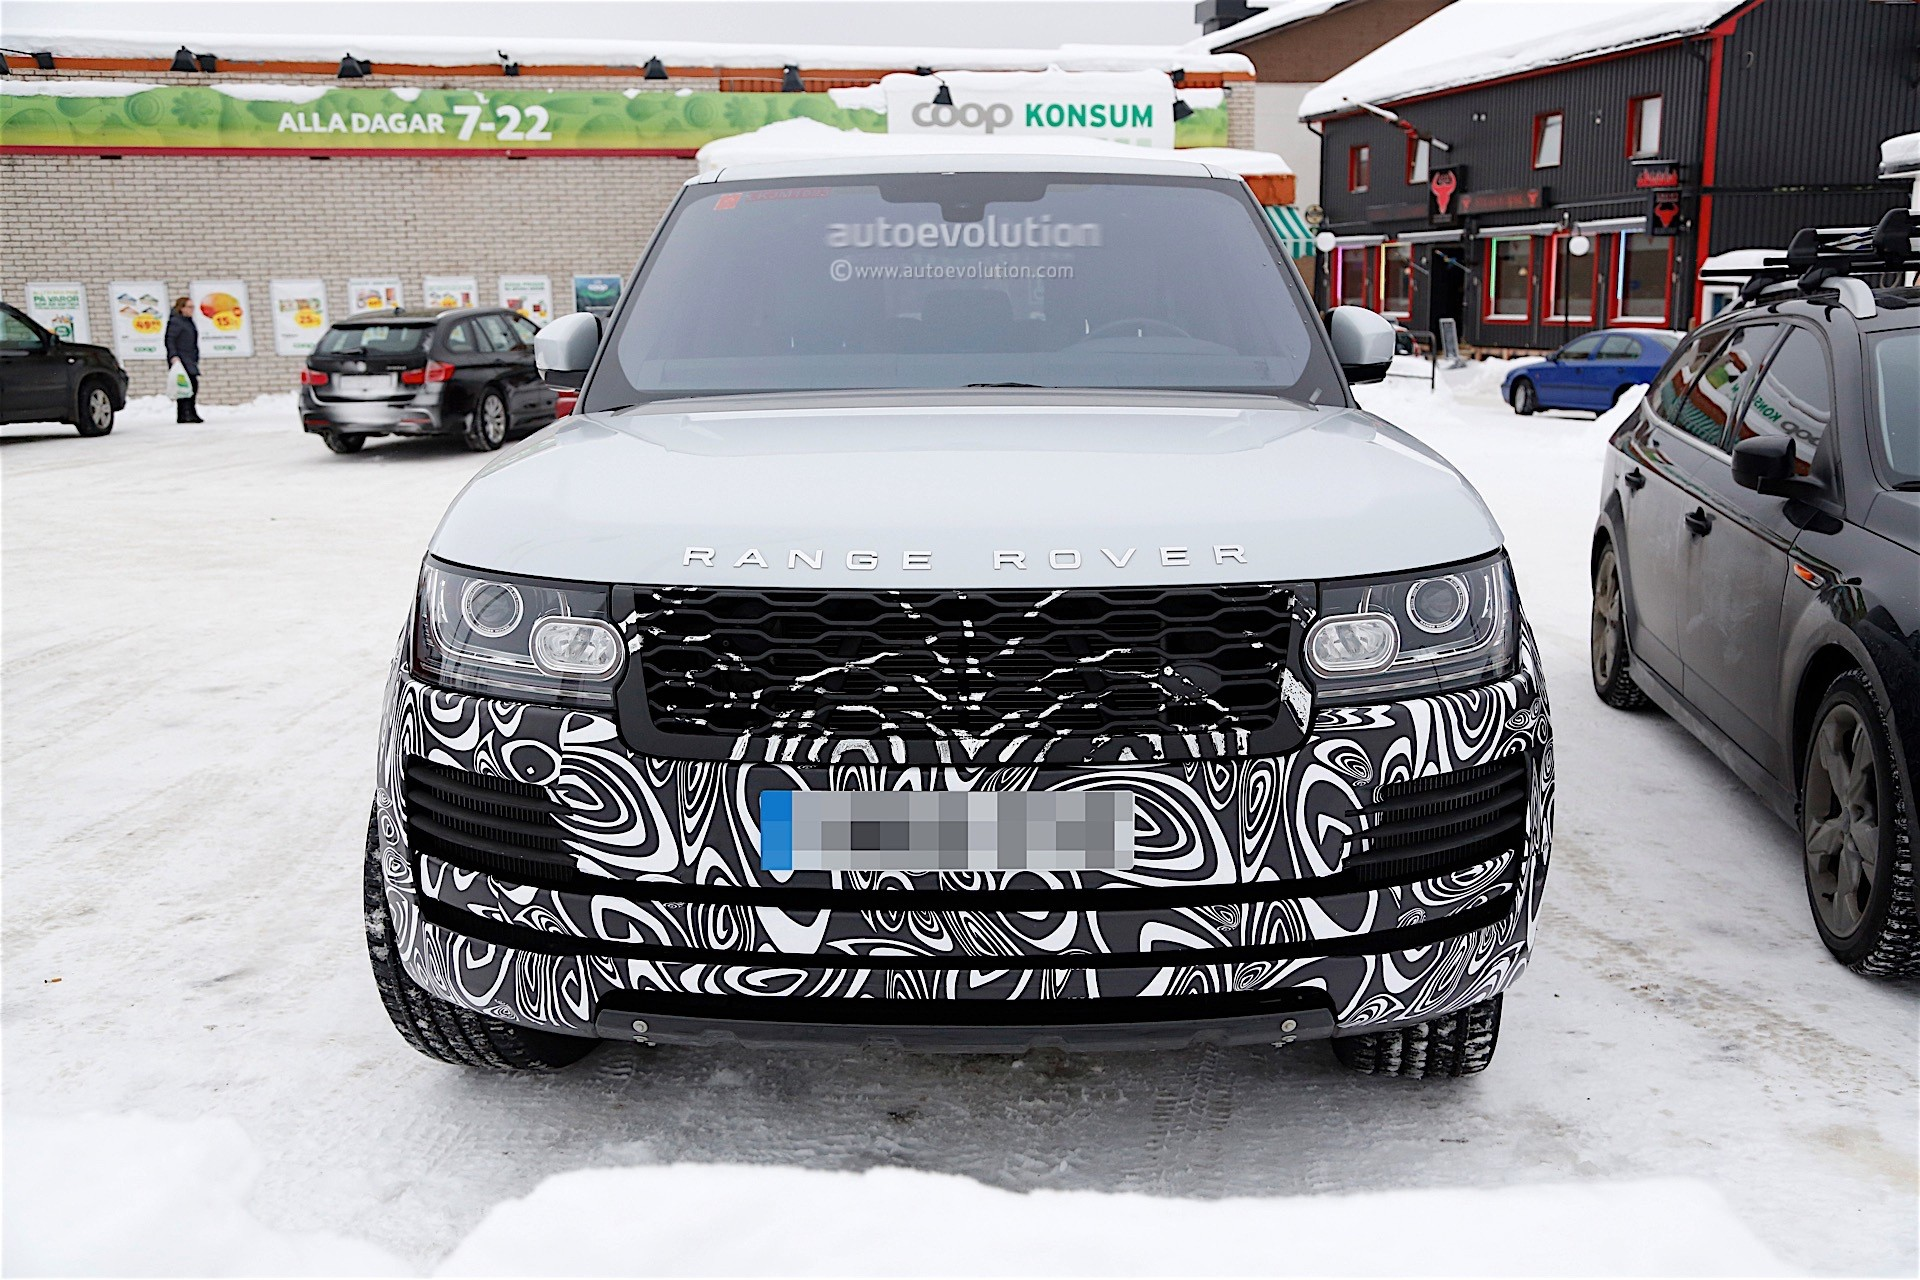 Range Rover Facelift Spy Shots